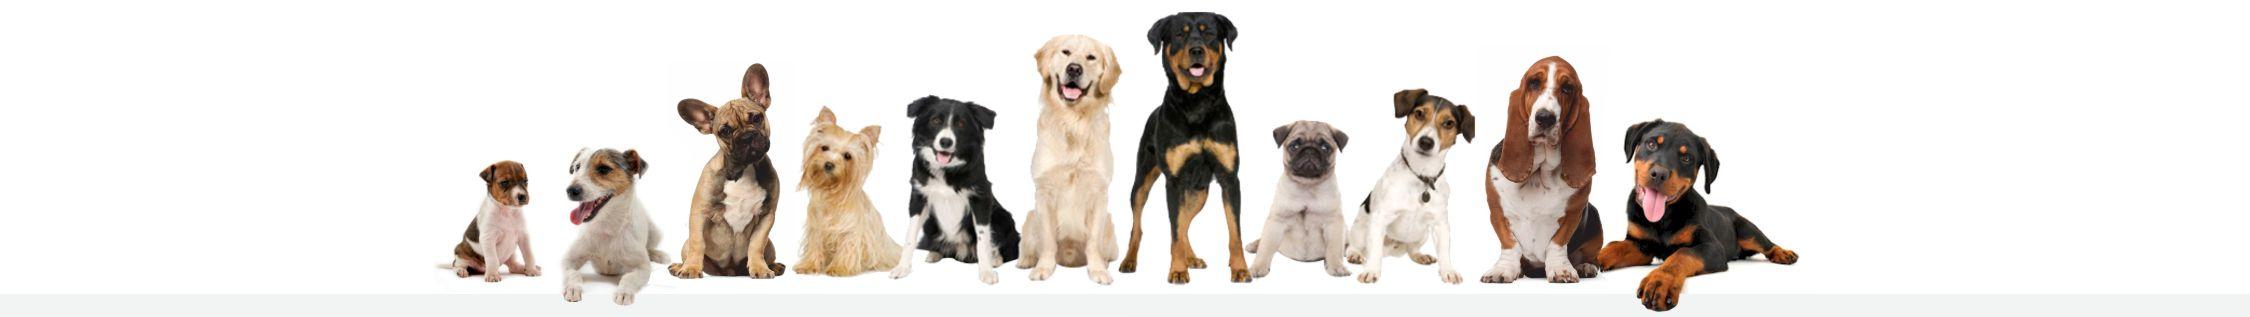 Dog Walking Bovey Tracey, Ogwell, Newton Abbot, Kingsteignton